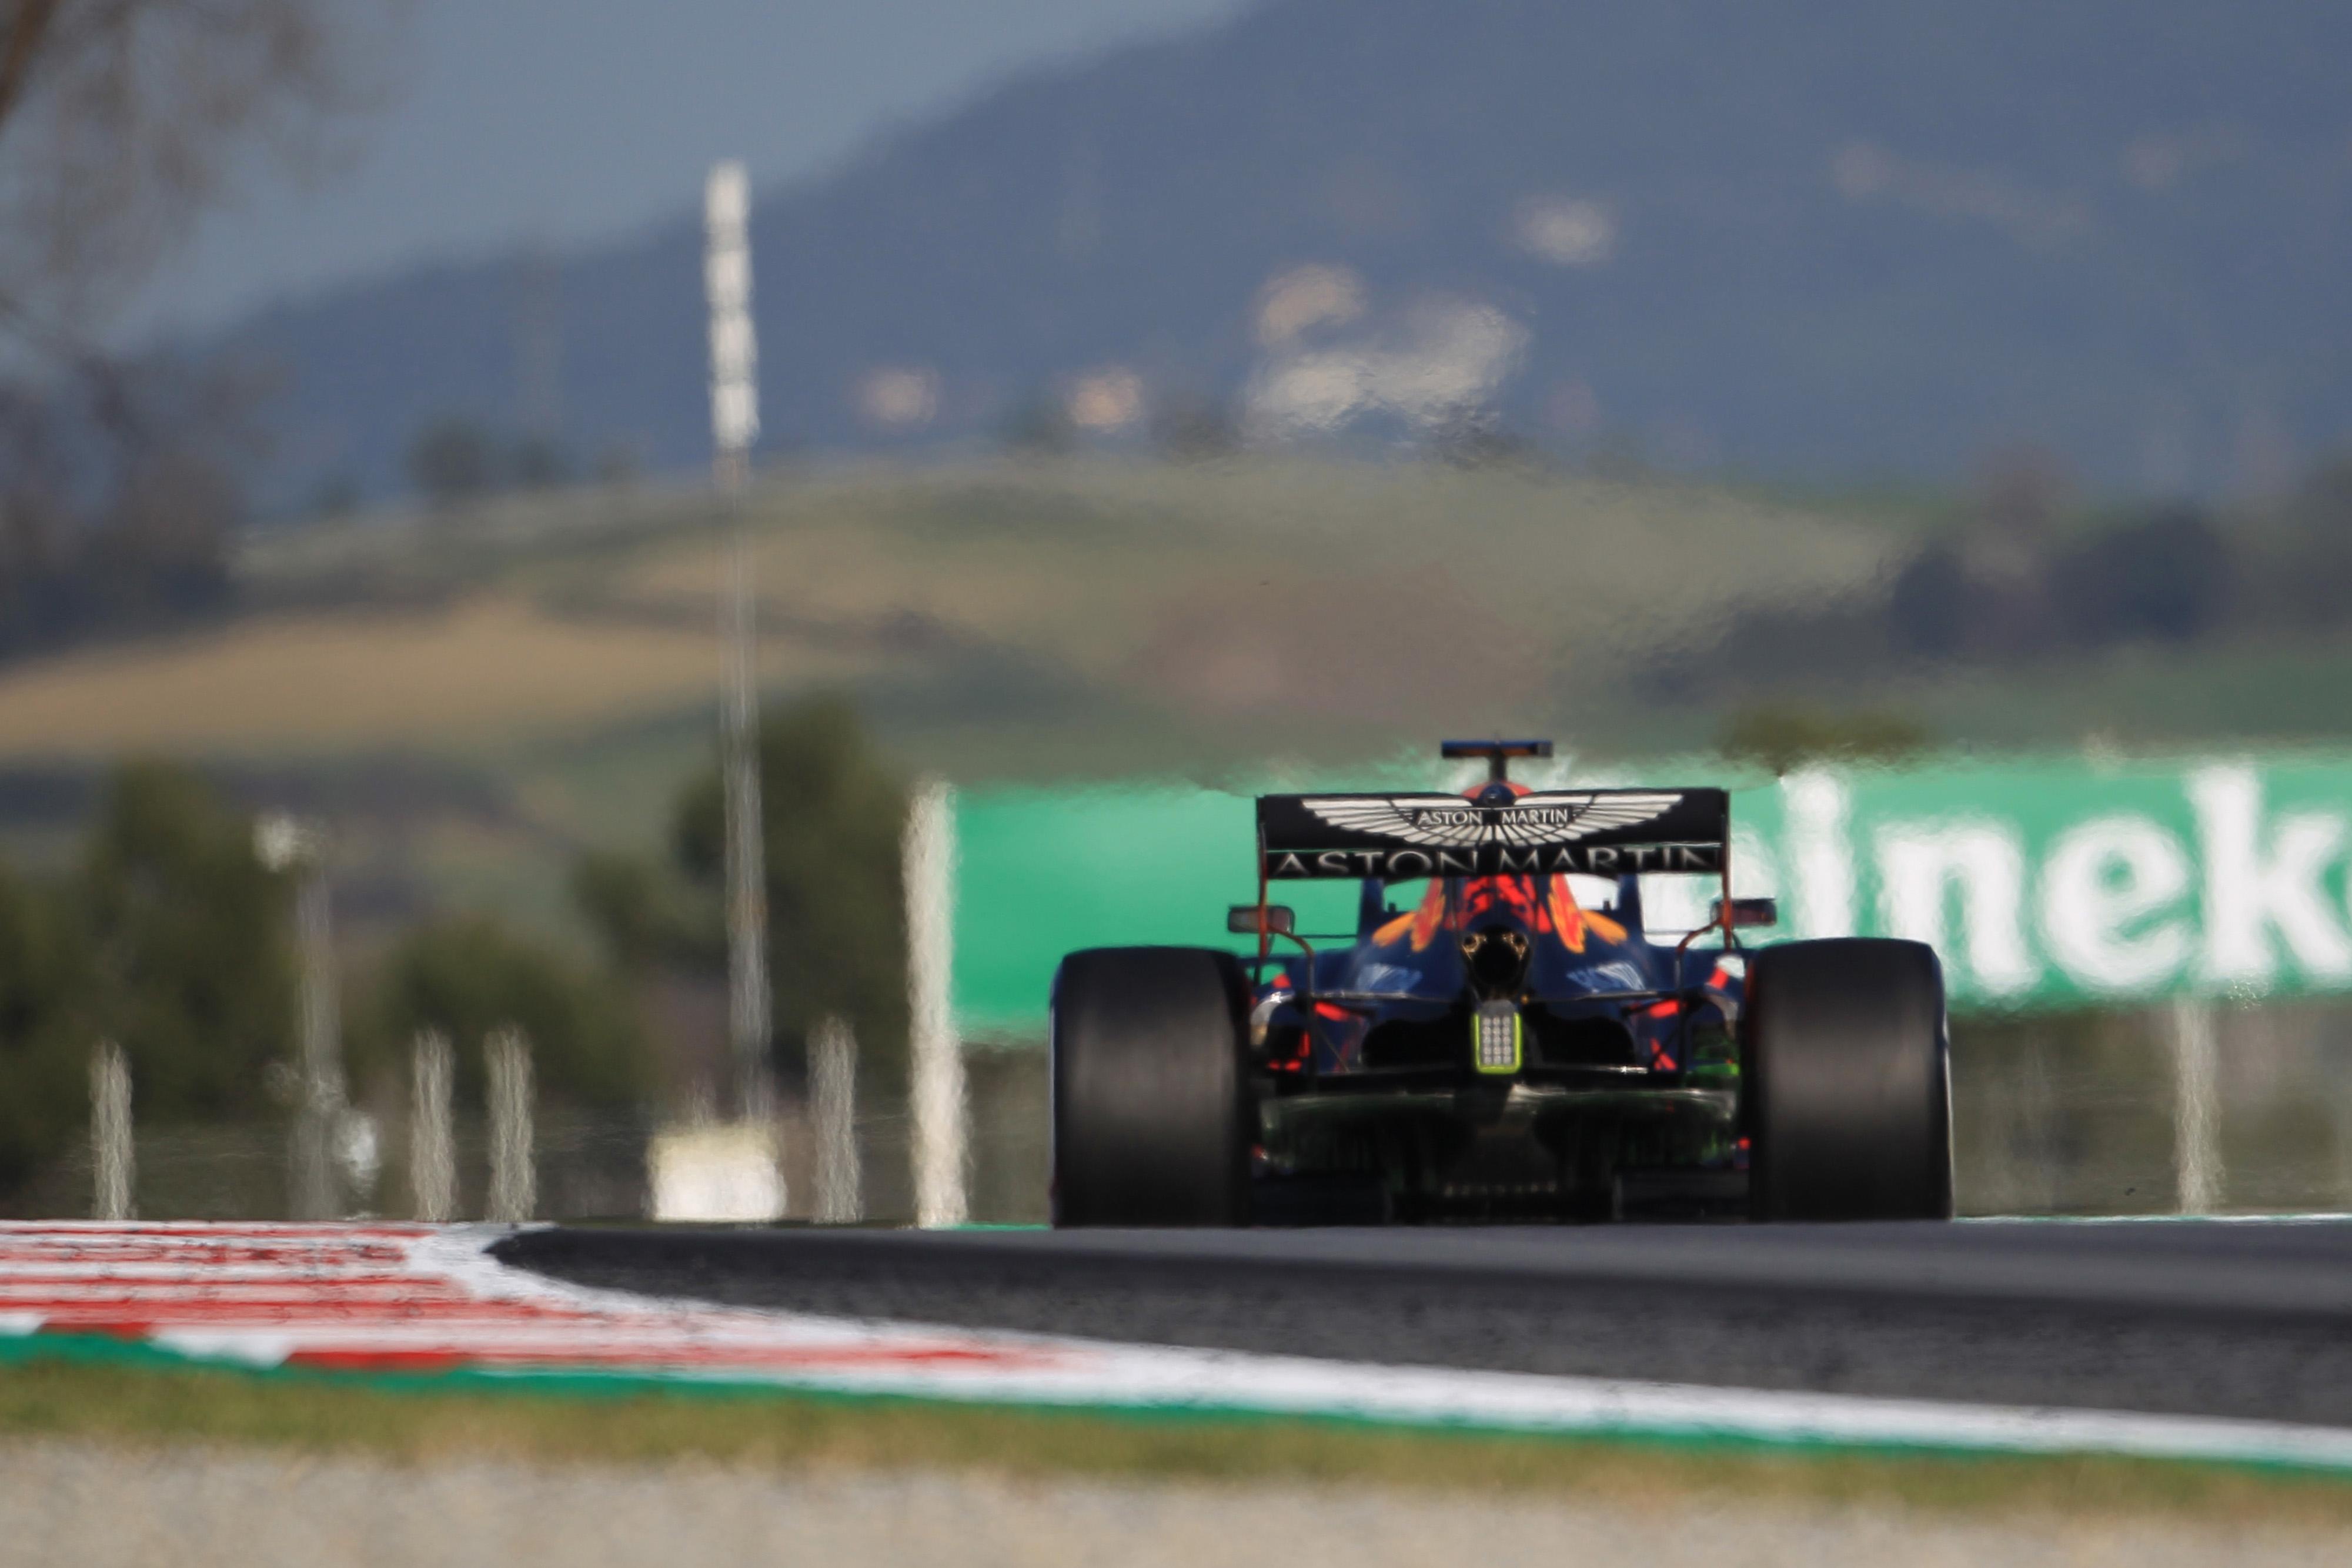 F1 Formula 1 Max Verstappen testing Red bull RB16 car